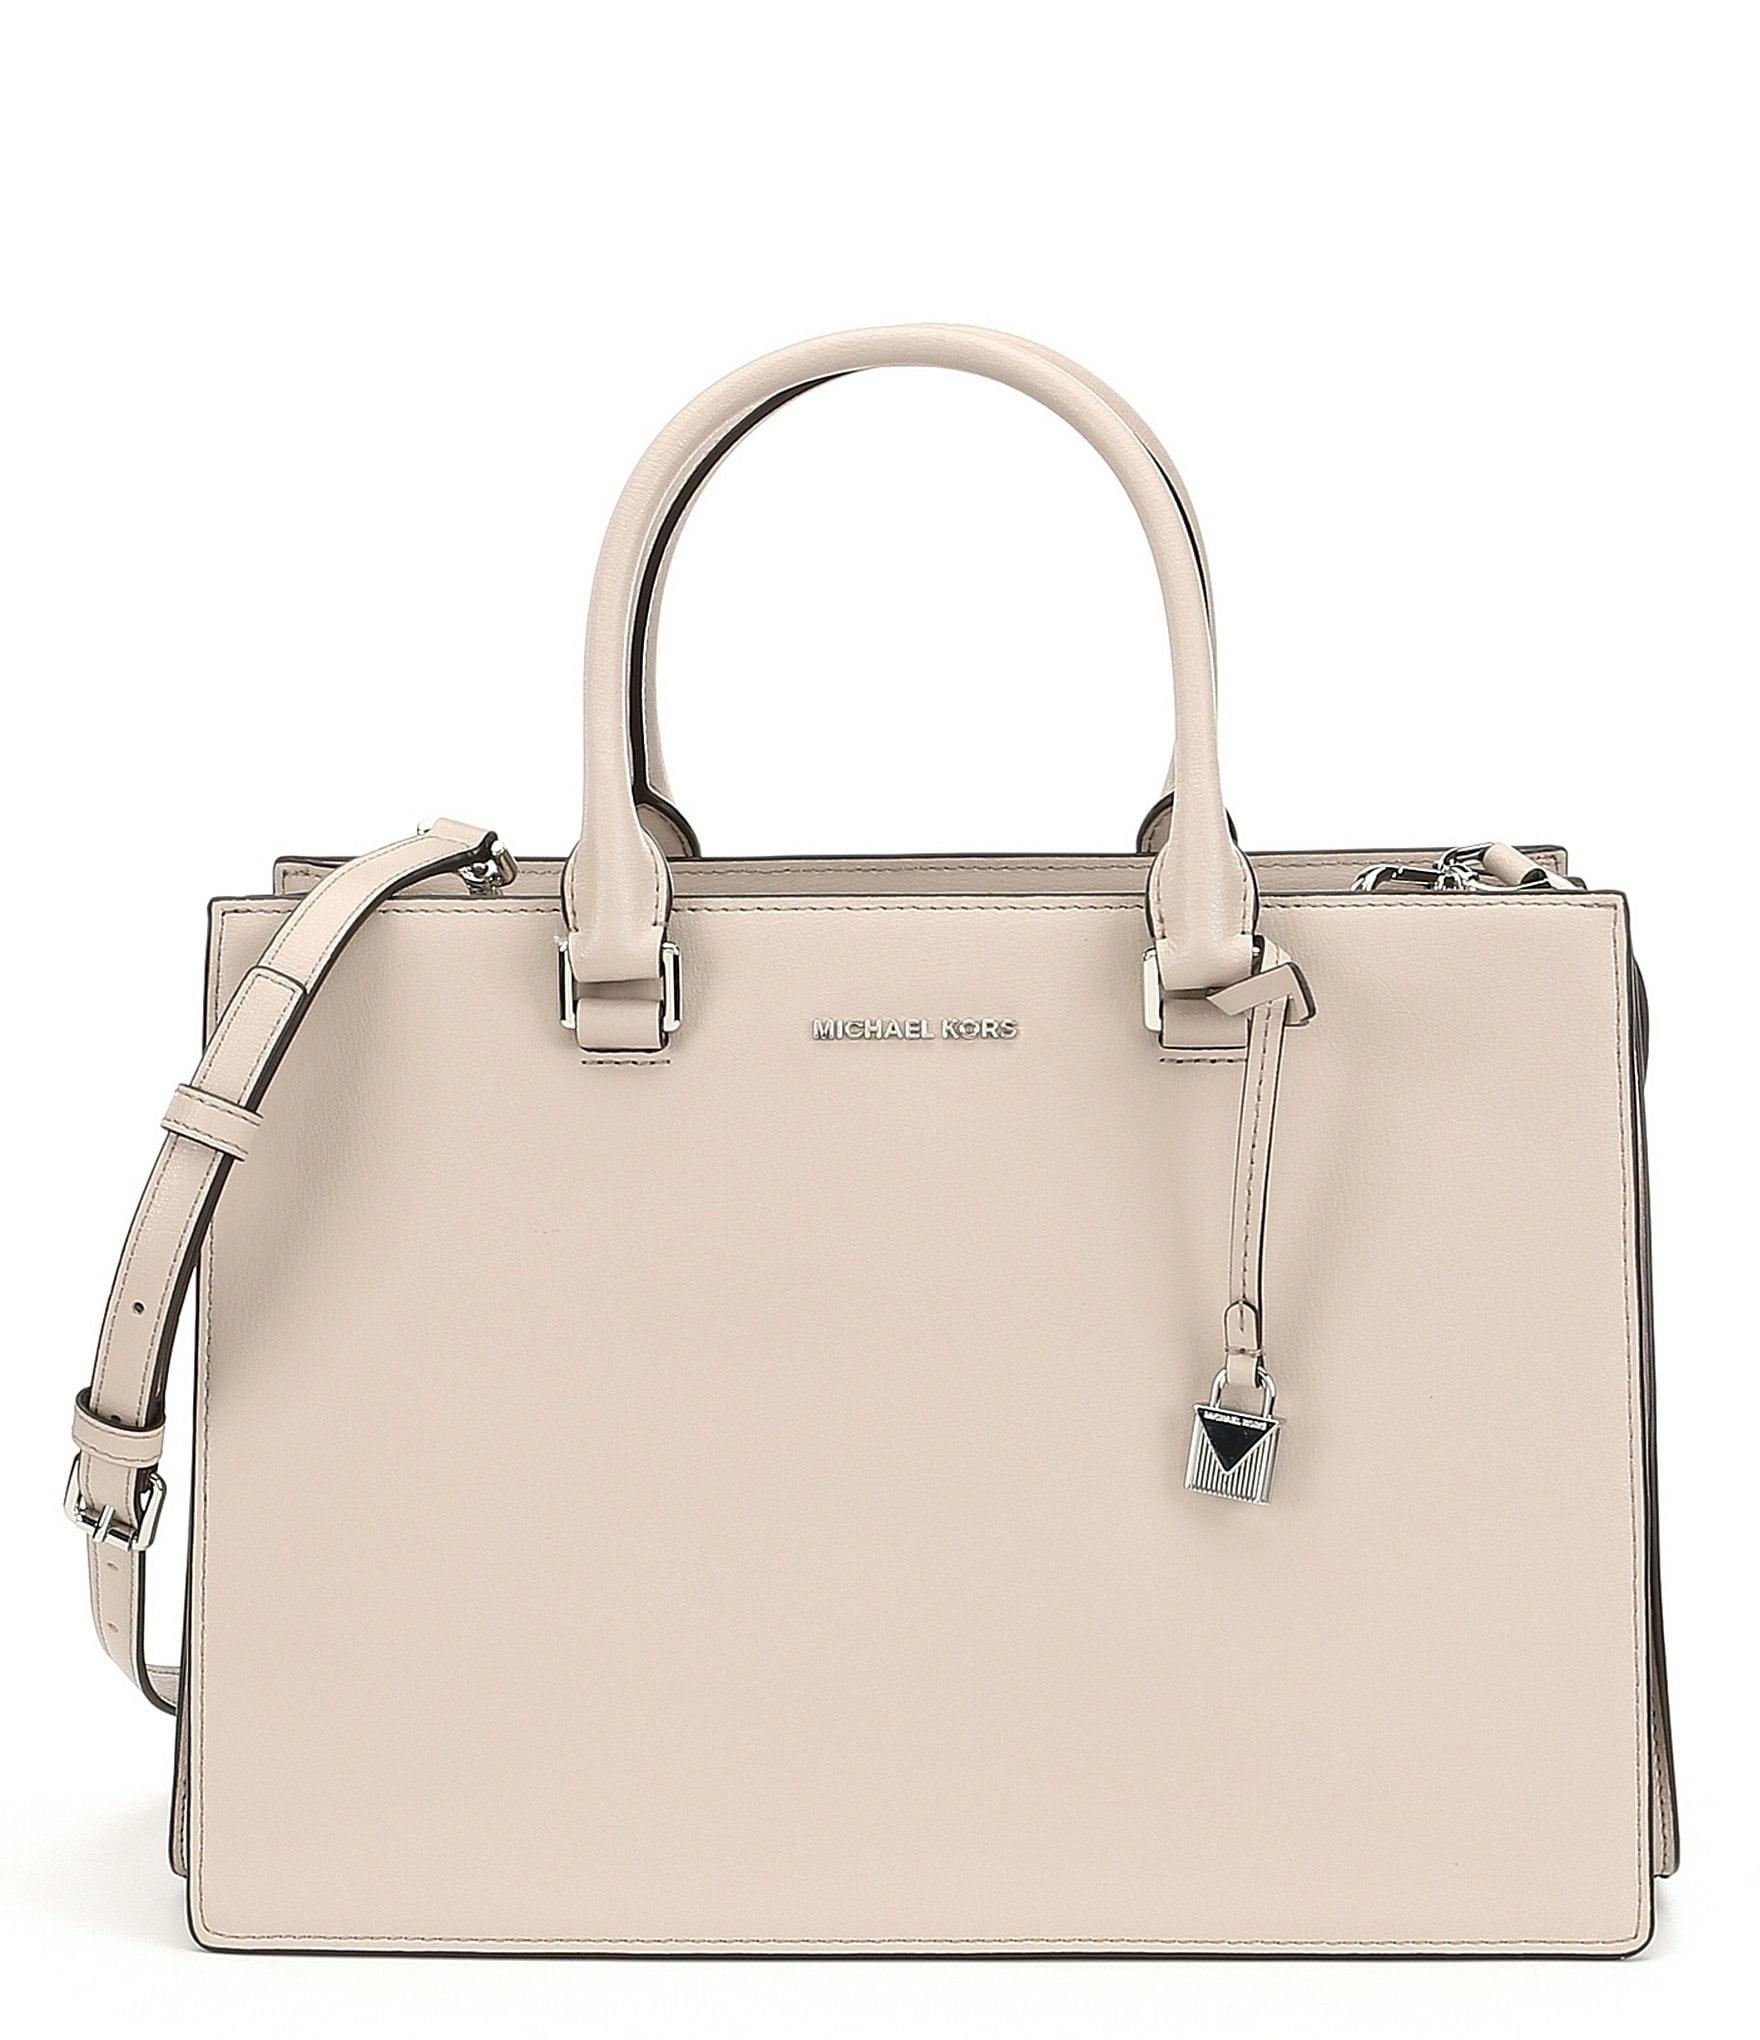 b28a7553c1da Buy michael kors silver handbag   OFF56% Discounted